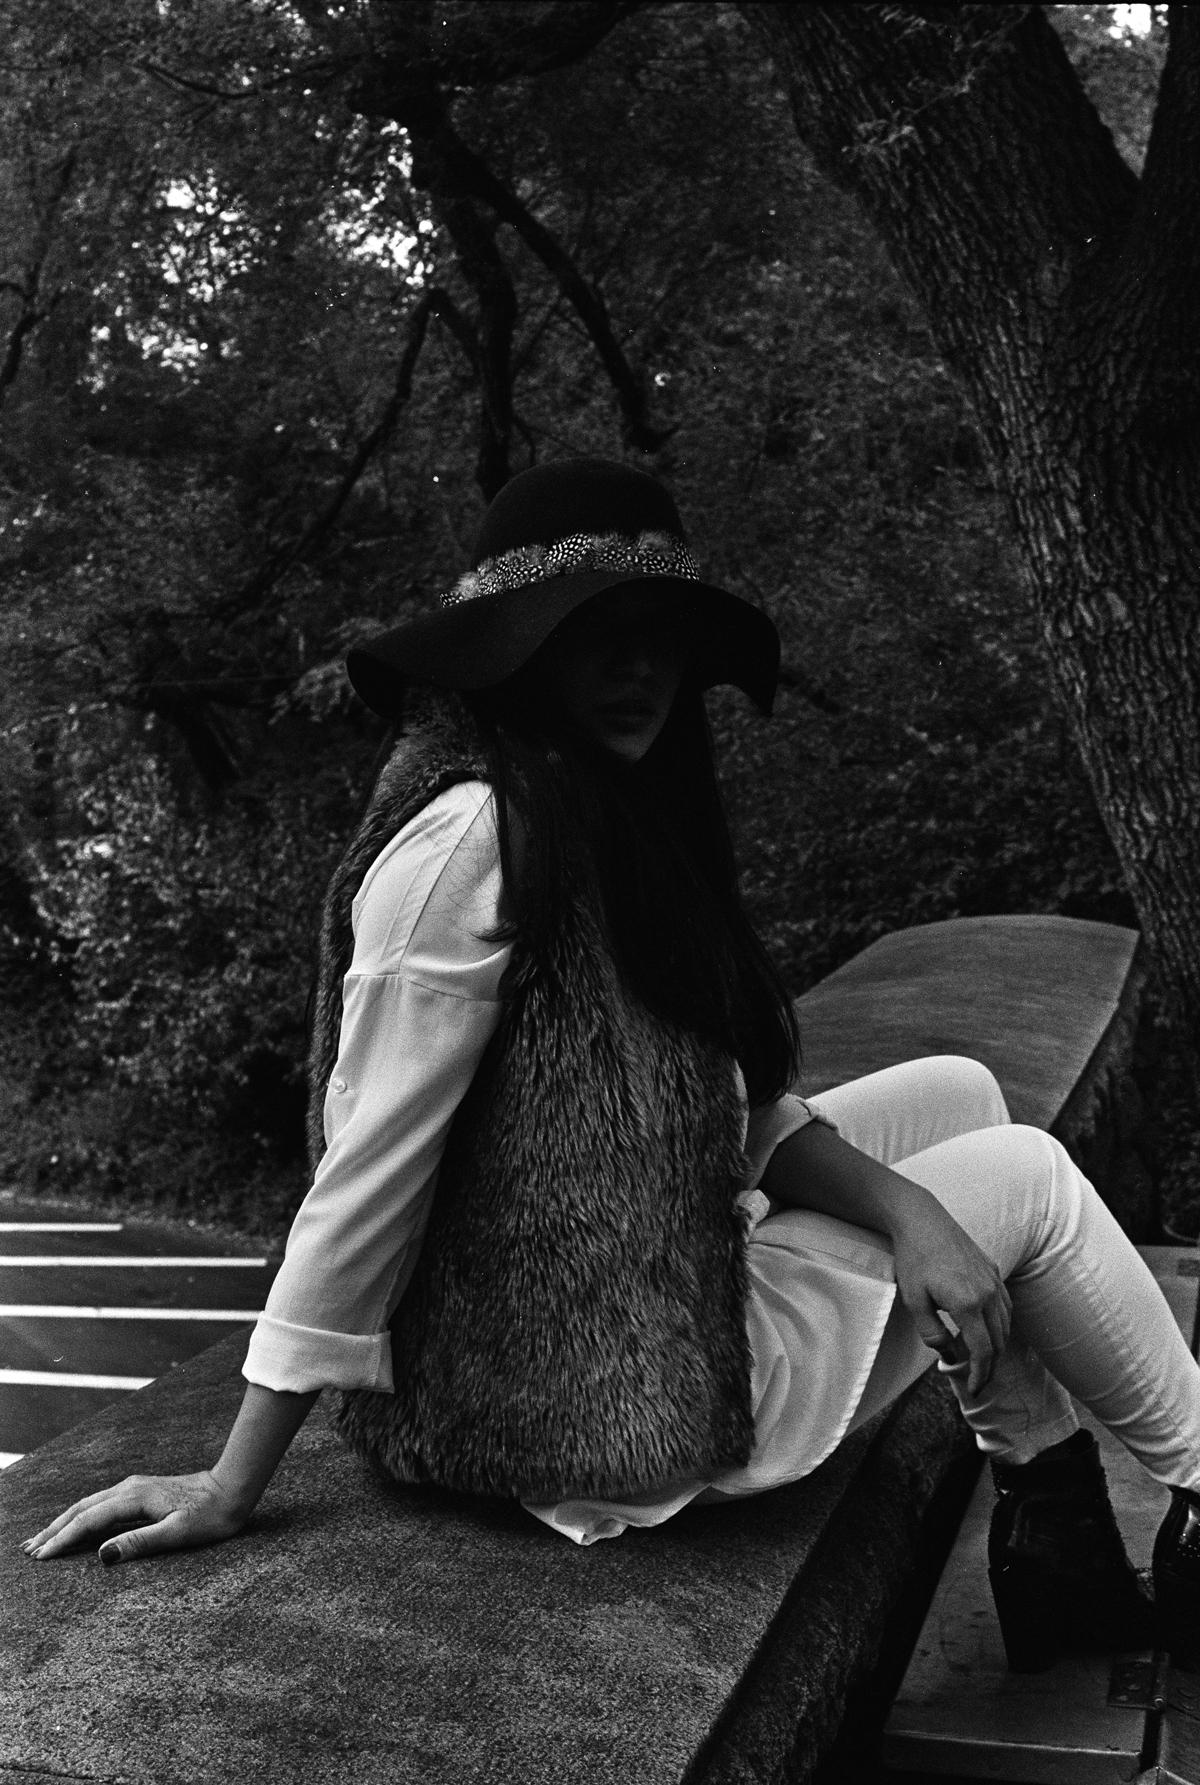 Victoria-Campa-Creep-9.jpg